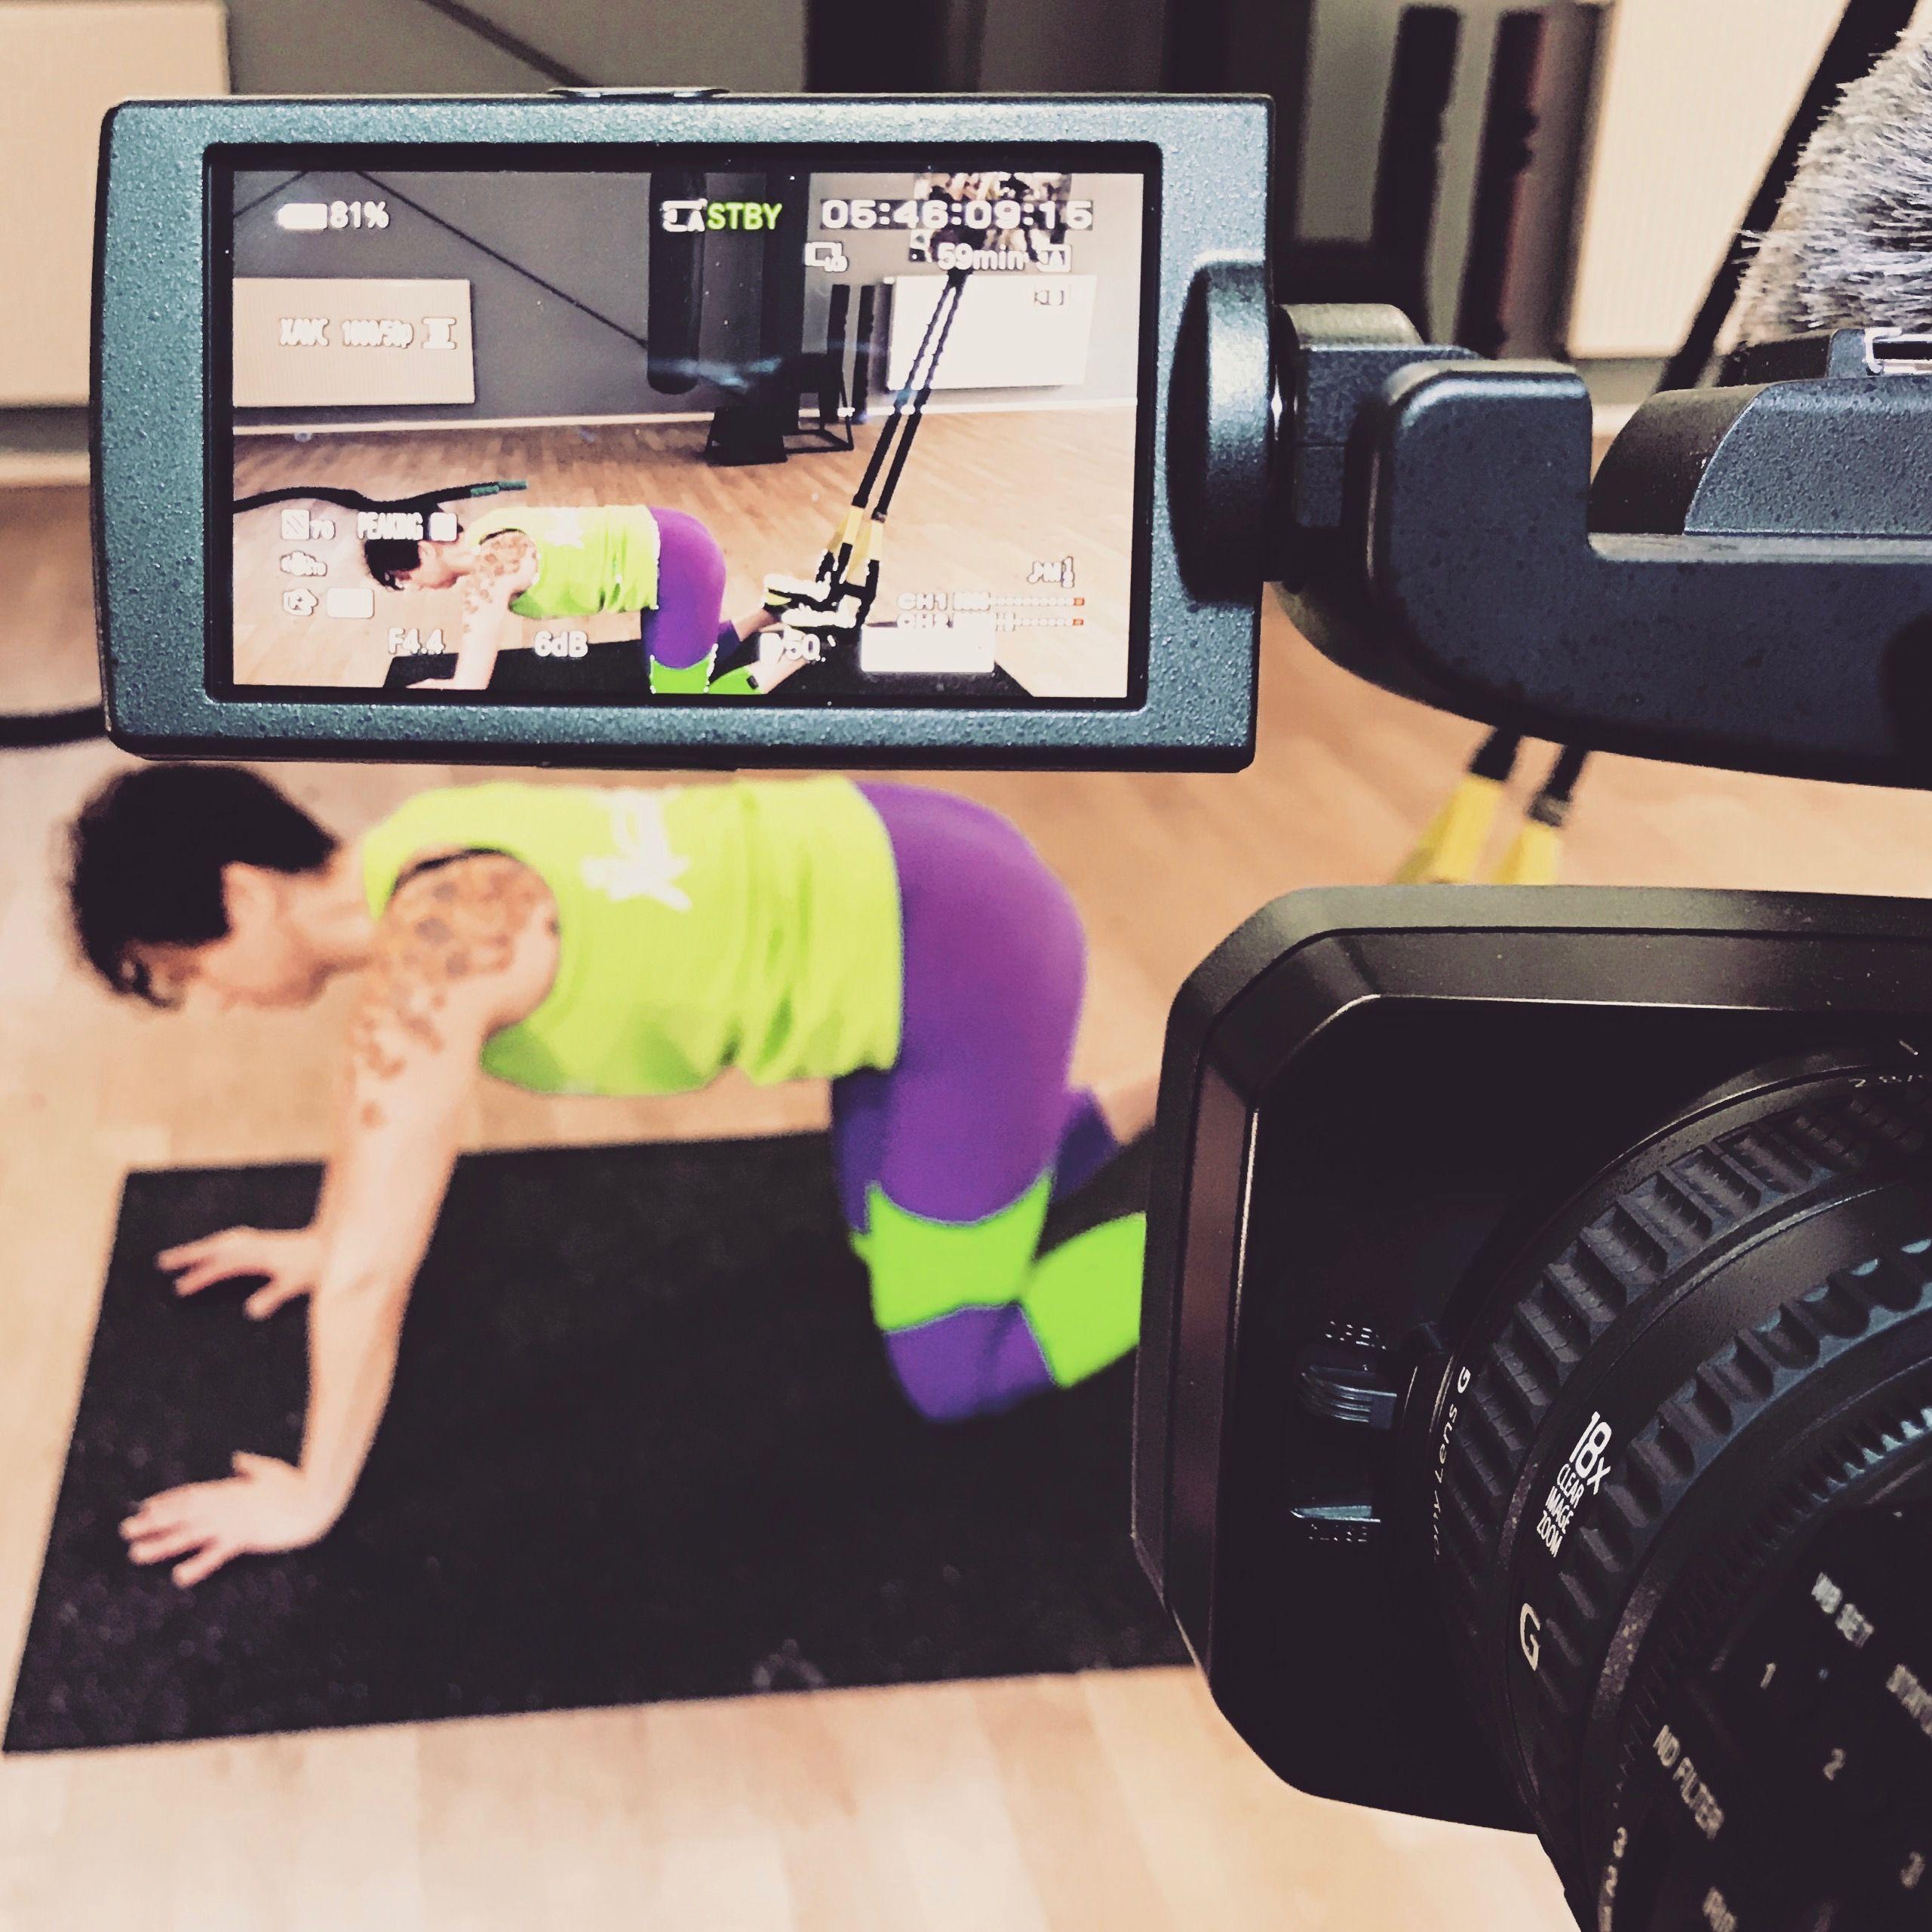 Anjas Fitnesstipps: (Nicht) hängen lassen